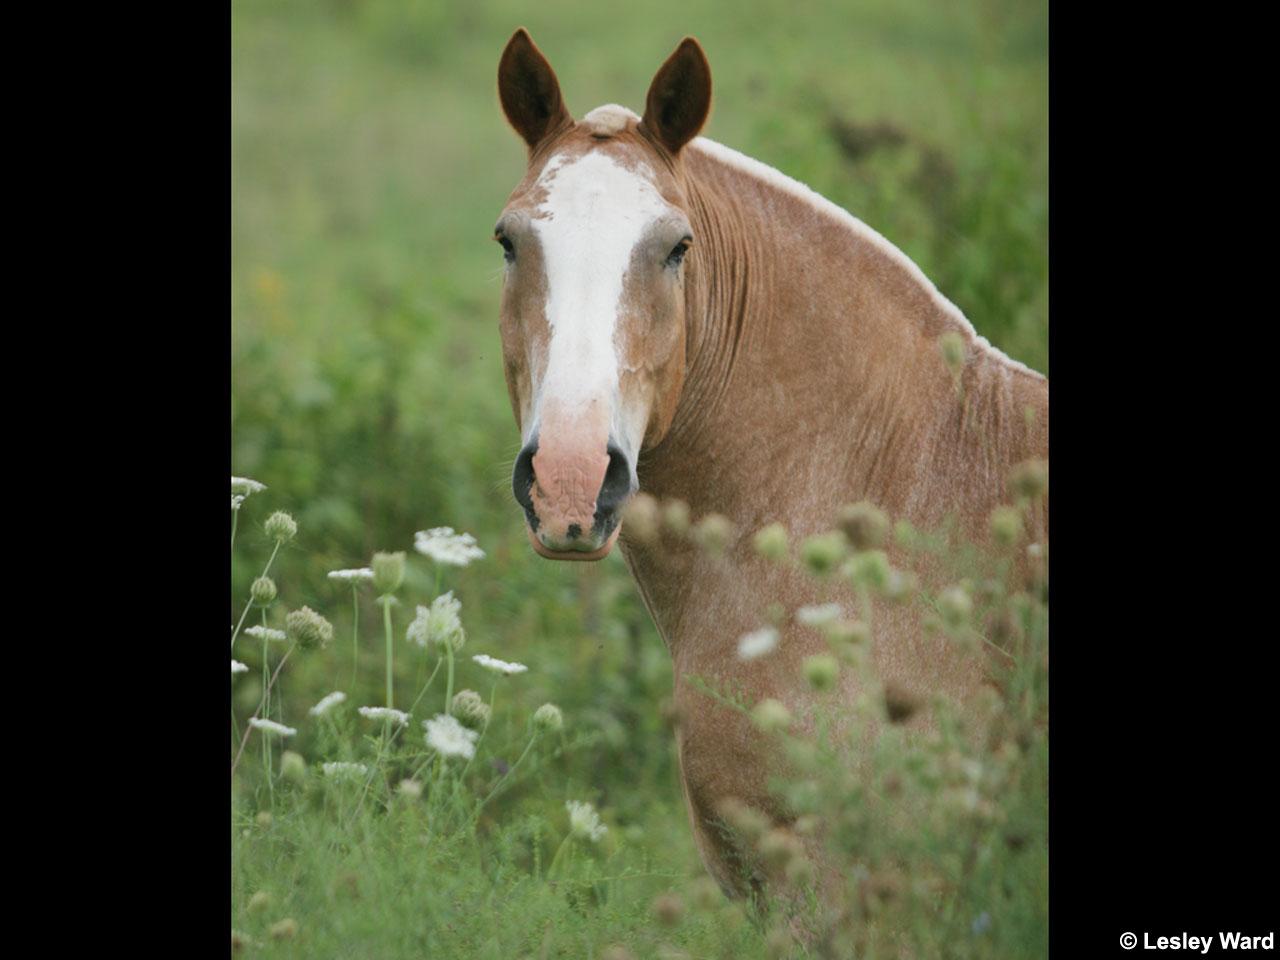 Draft Horse Desktop Wallpapers and Screensaver 1280x960